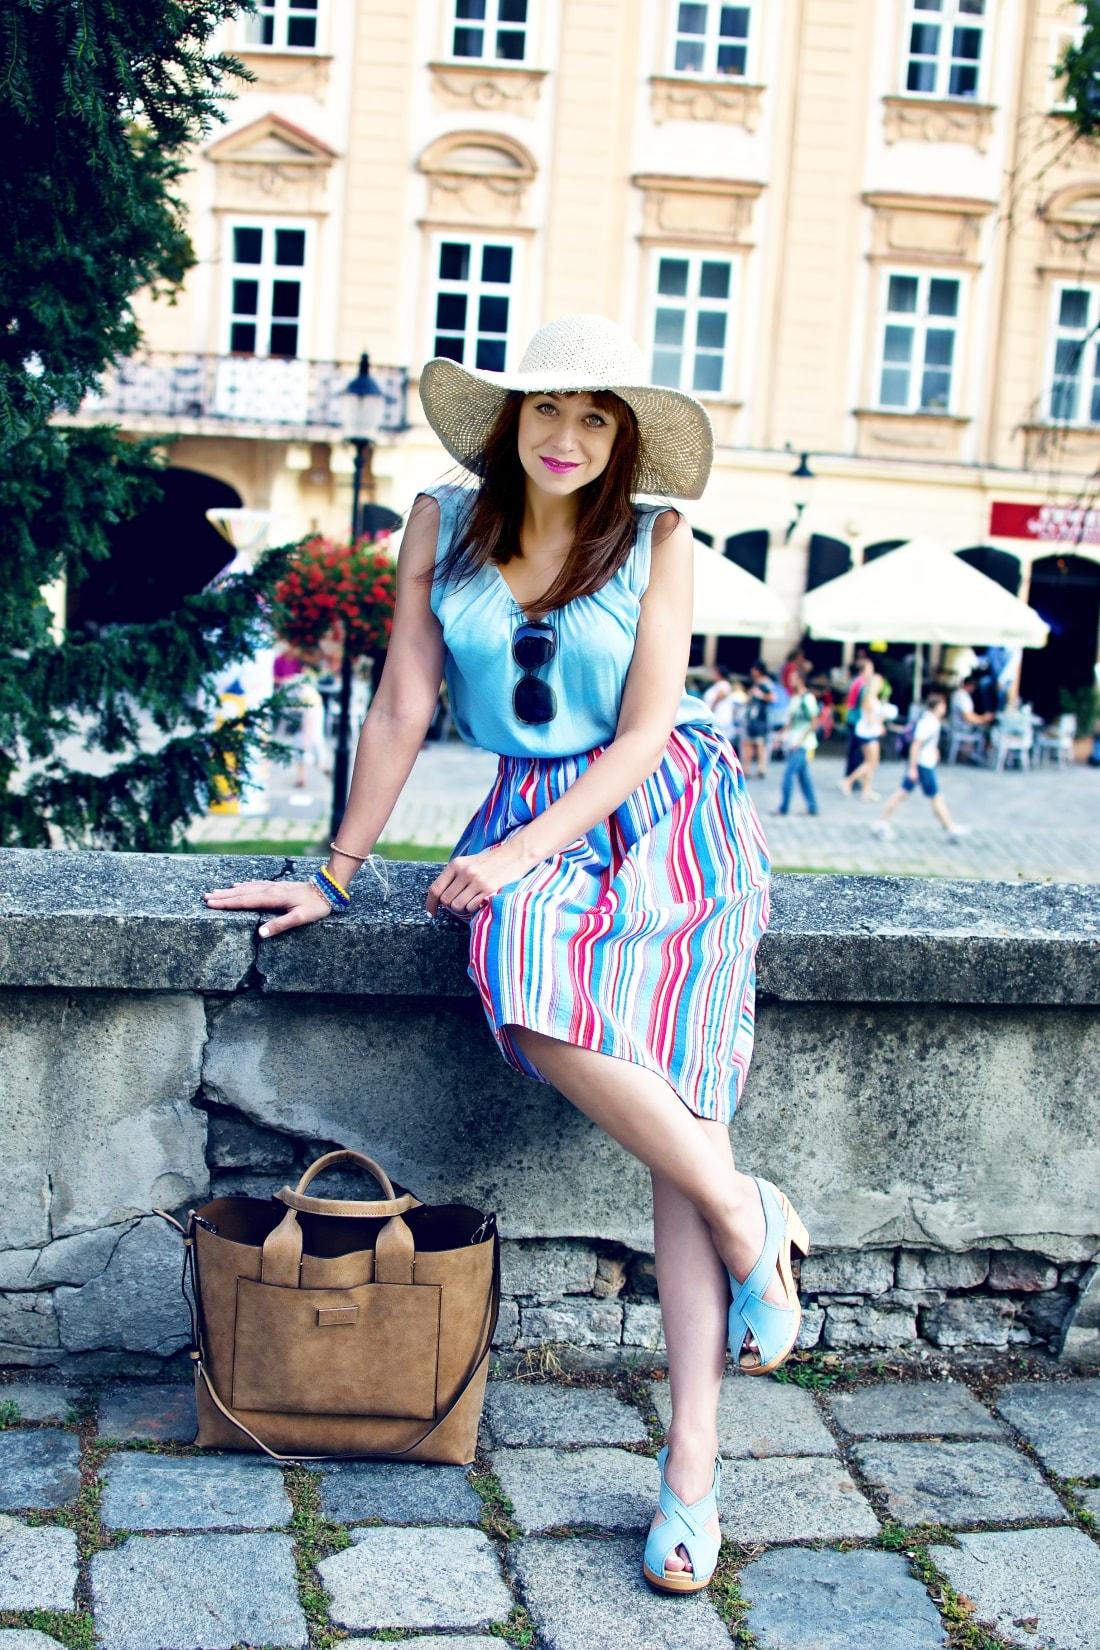 Handmade clogs_Katharine-fashion is beautiful blog 12a_Sandgrens_Modré Dreváky_Prúžkovaná sukňa_Katarína Jakubčová_Fashion blogger